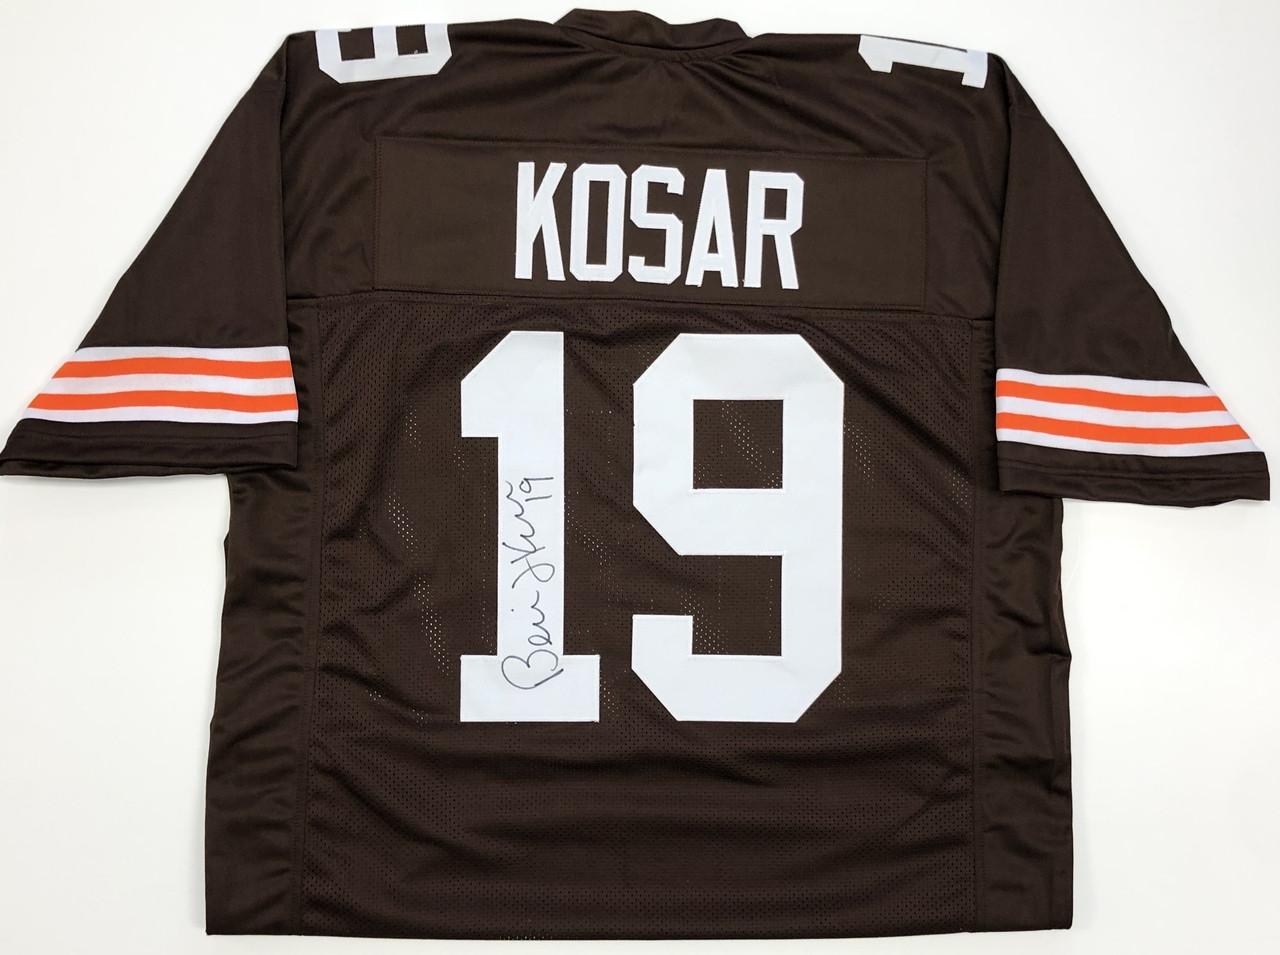 finest selection 4544c d8707 Bernie Kosar Cleveland Browns Autographed Jersey - Certified Authentic